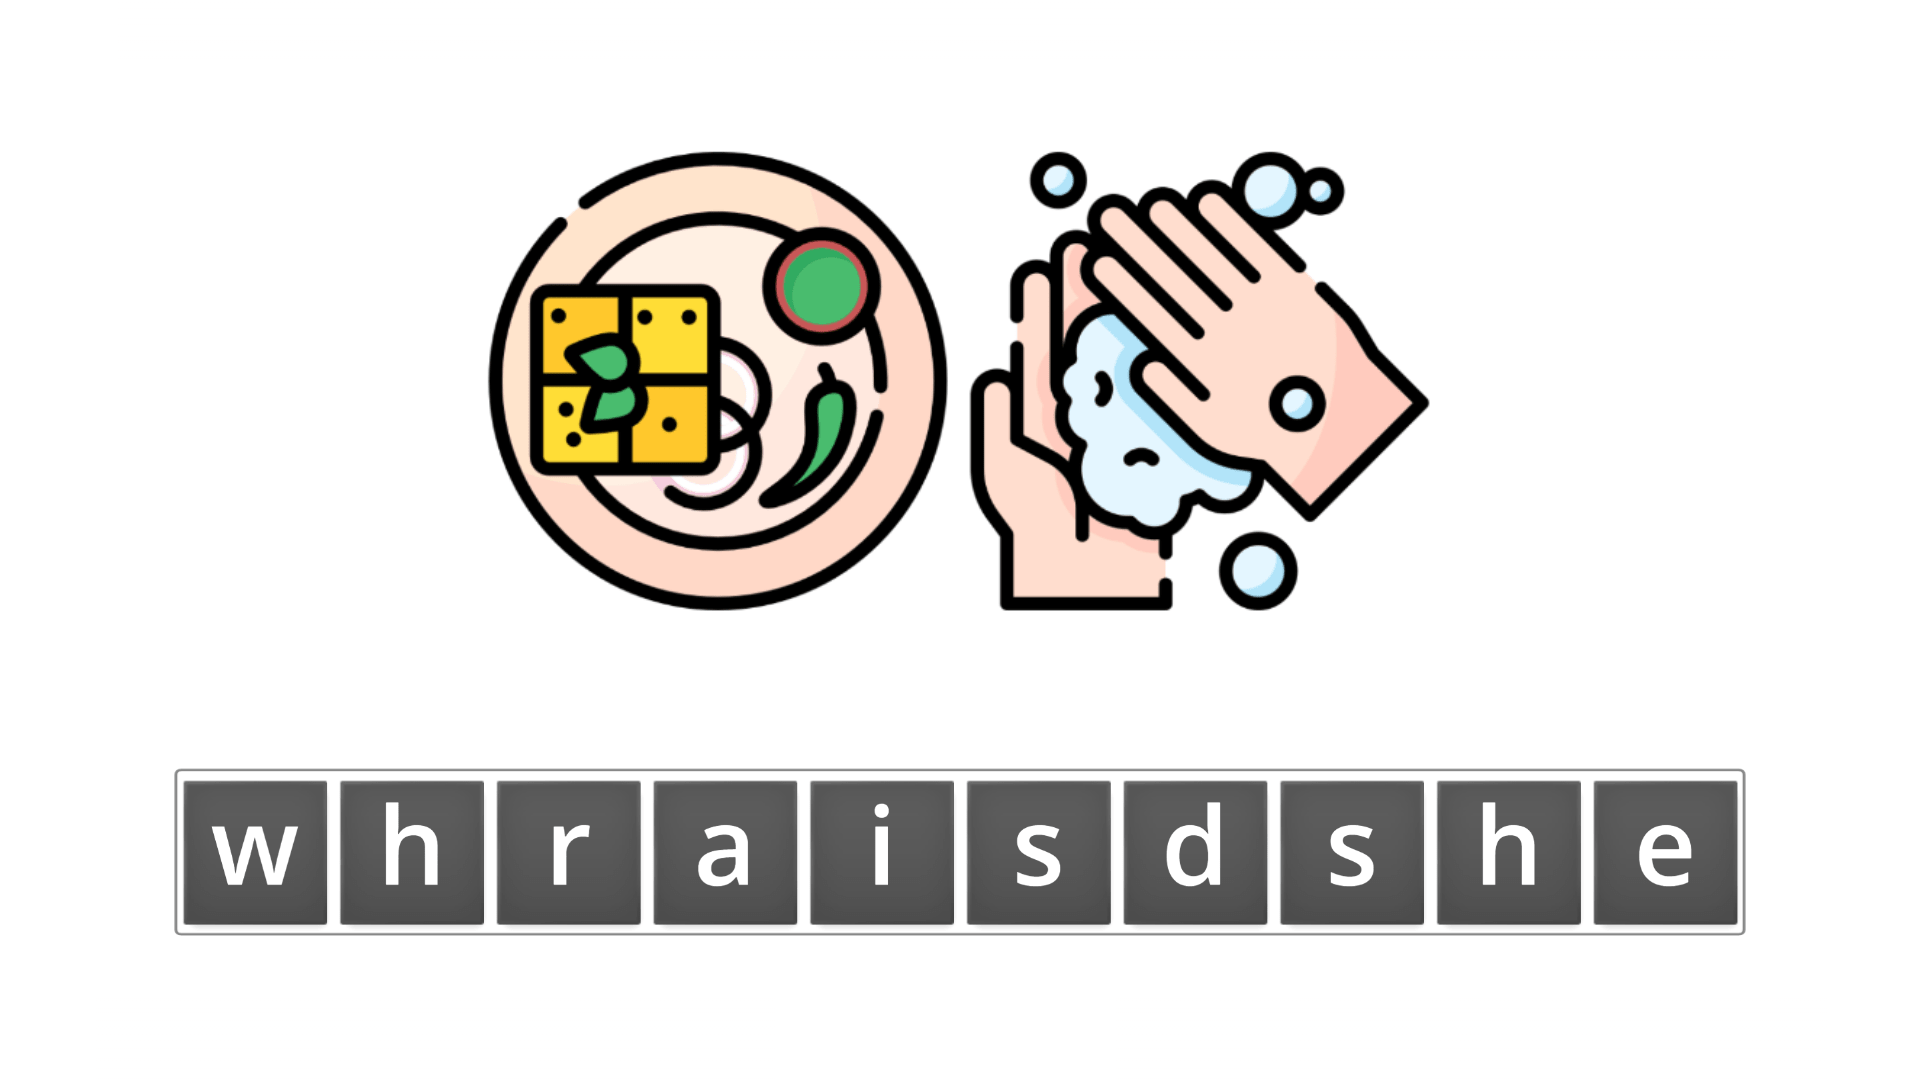 esl resources - flashcards - compound nouns  - unscramble - dishwasher